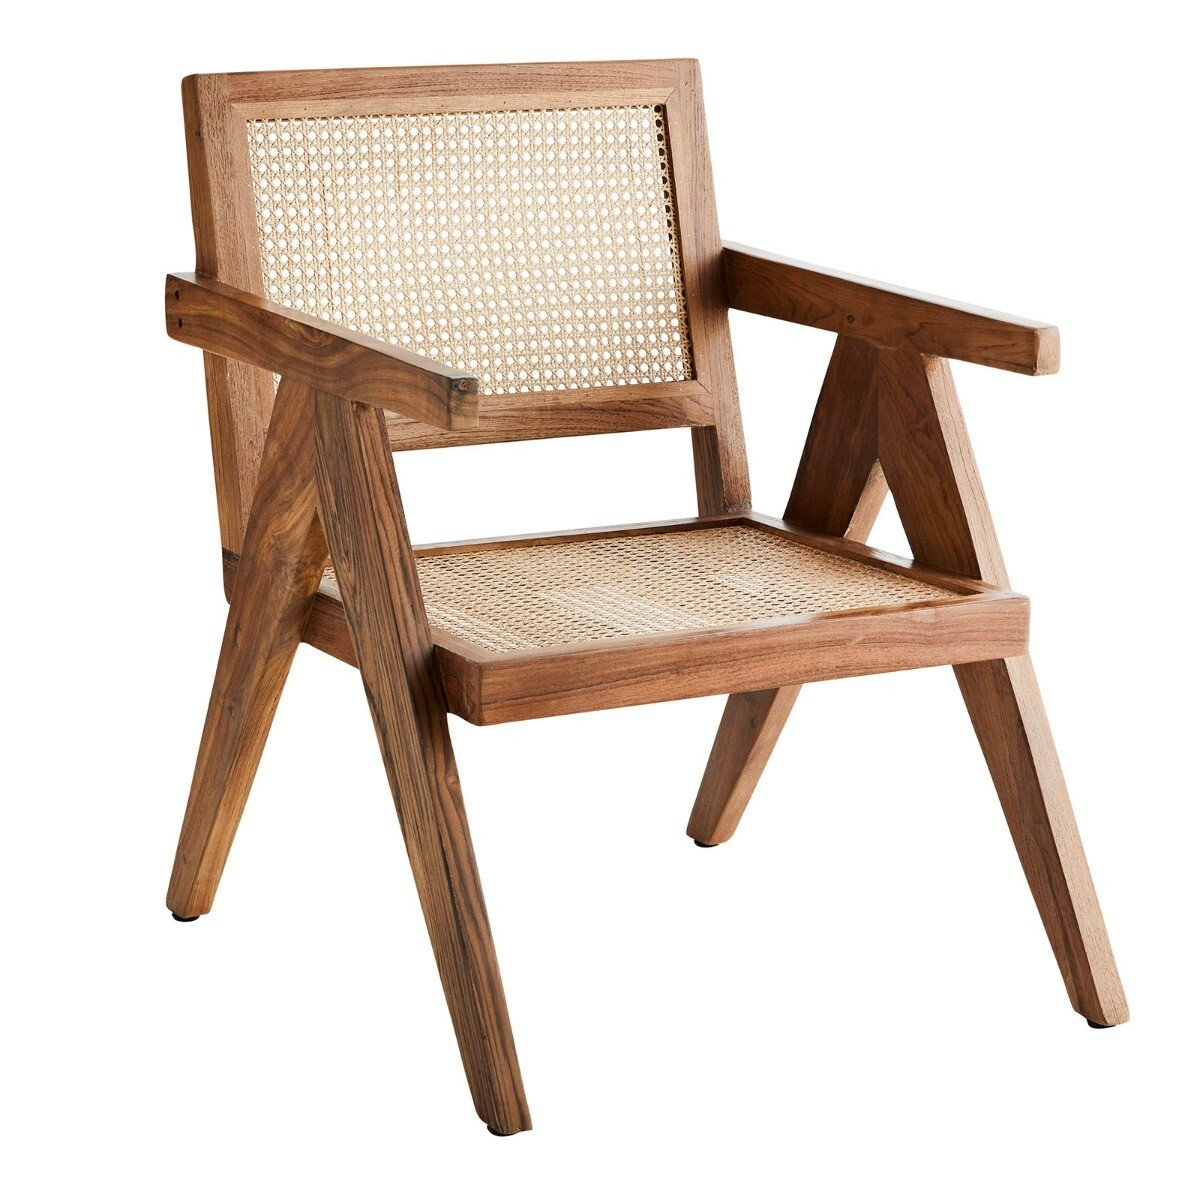 Madam Stoltz lounge stoel hout naturel 80 x 55 x 55